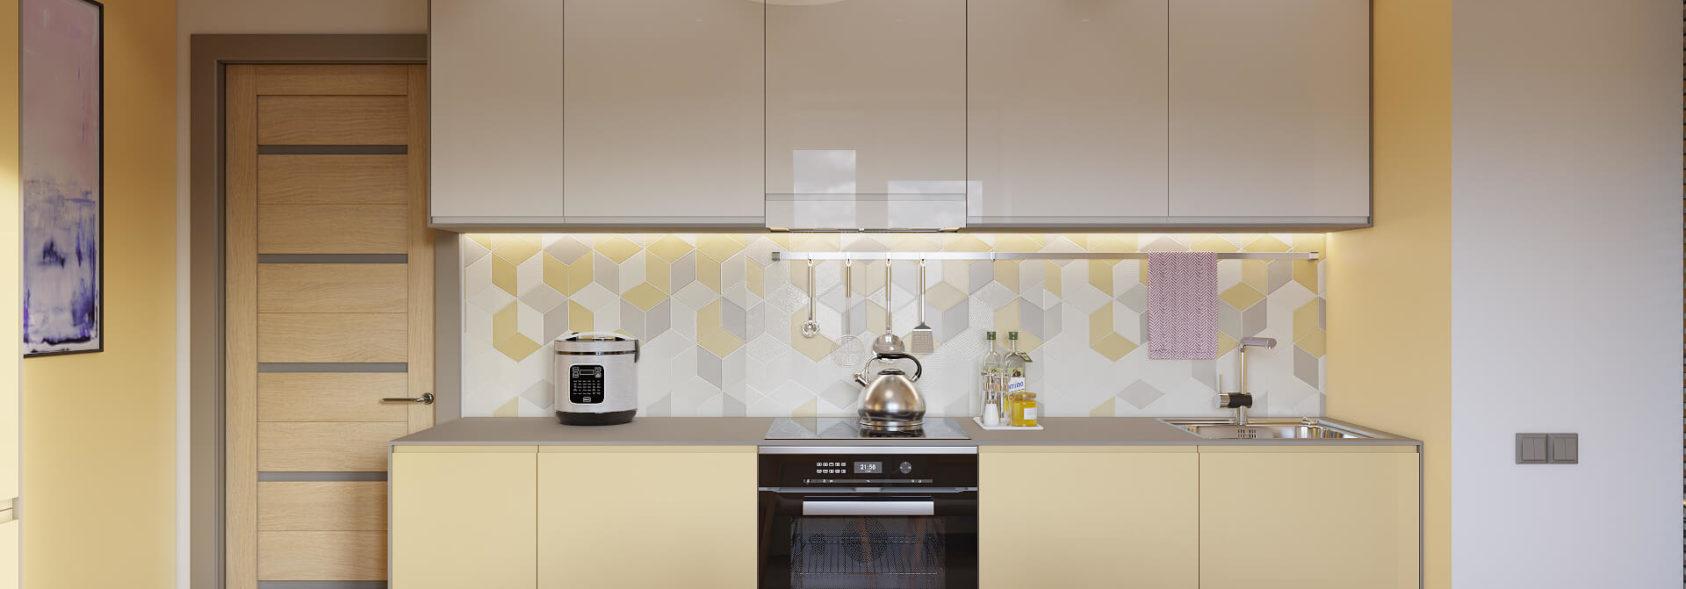 Дизайн квартиры Киев - Дизайн интерьера кухни Киев